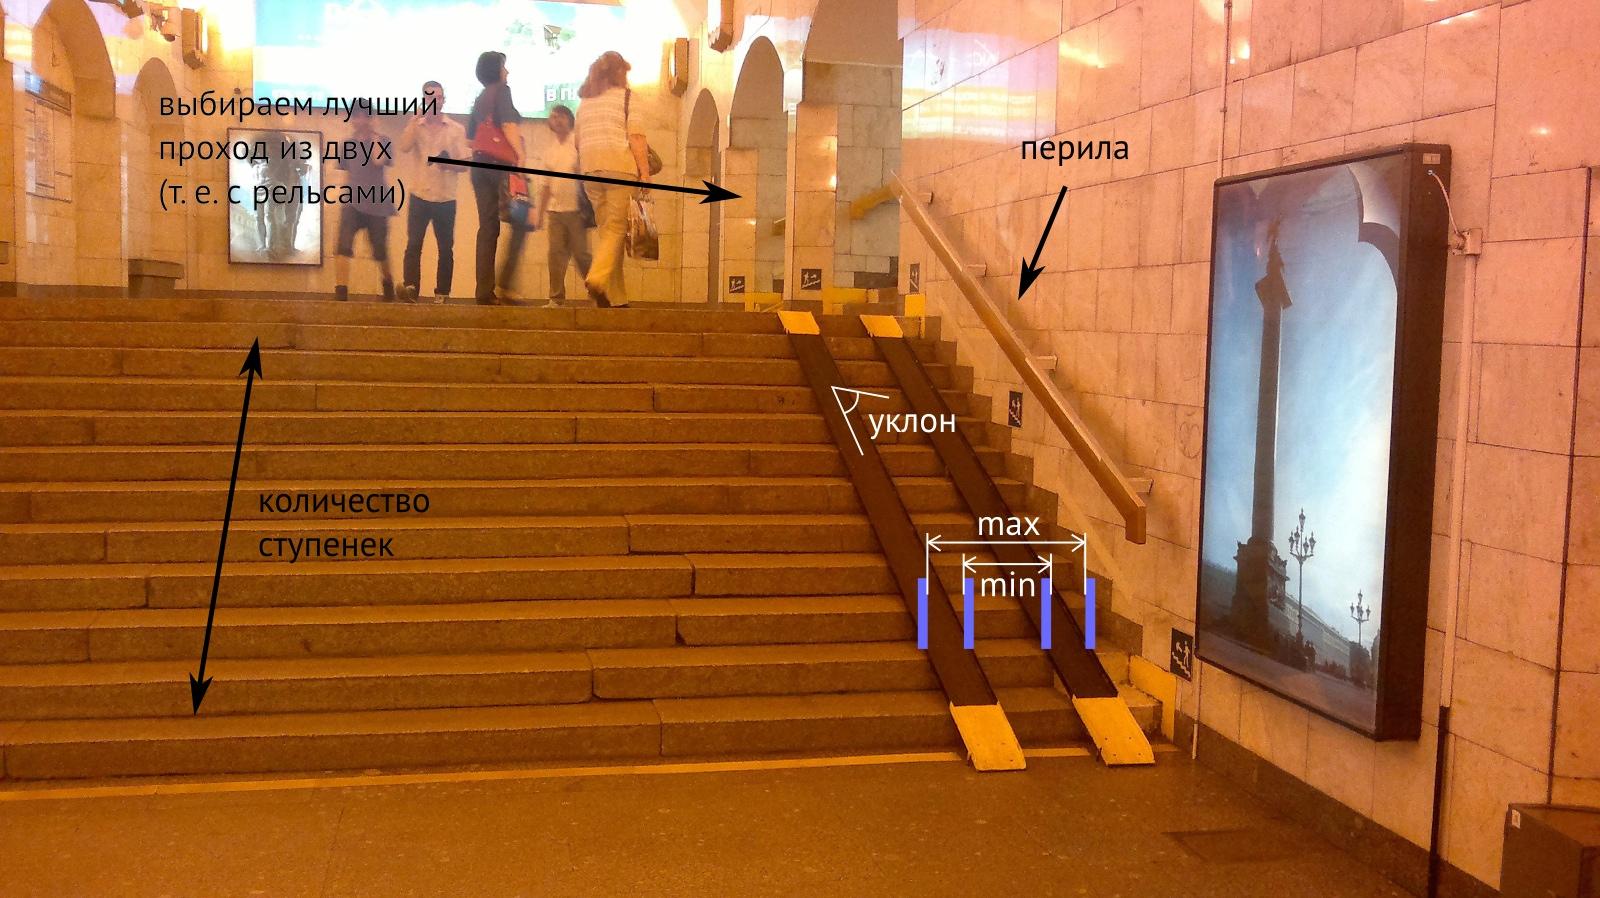 Metro-staircase.jpg